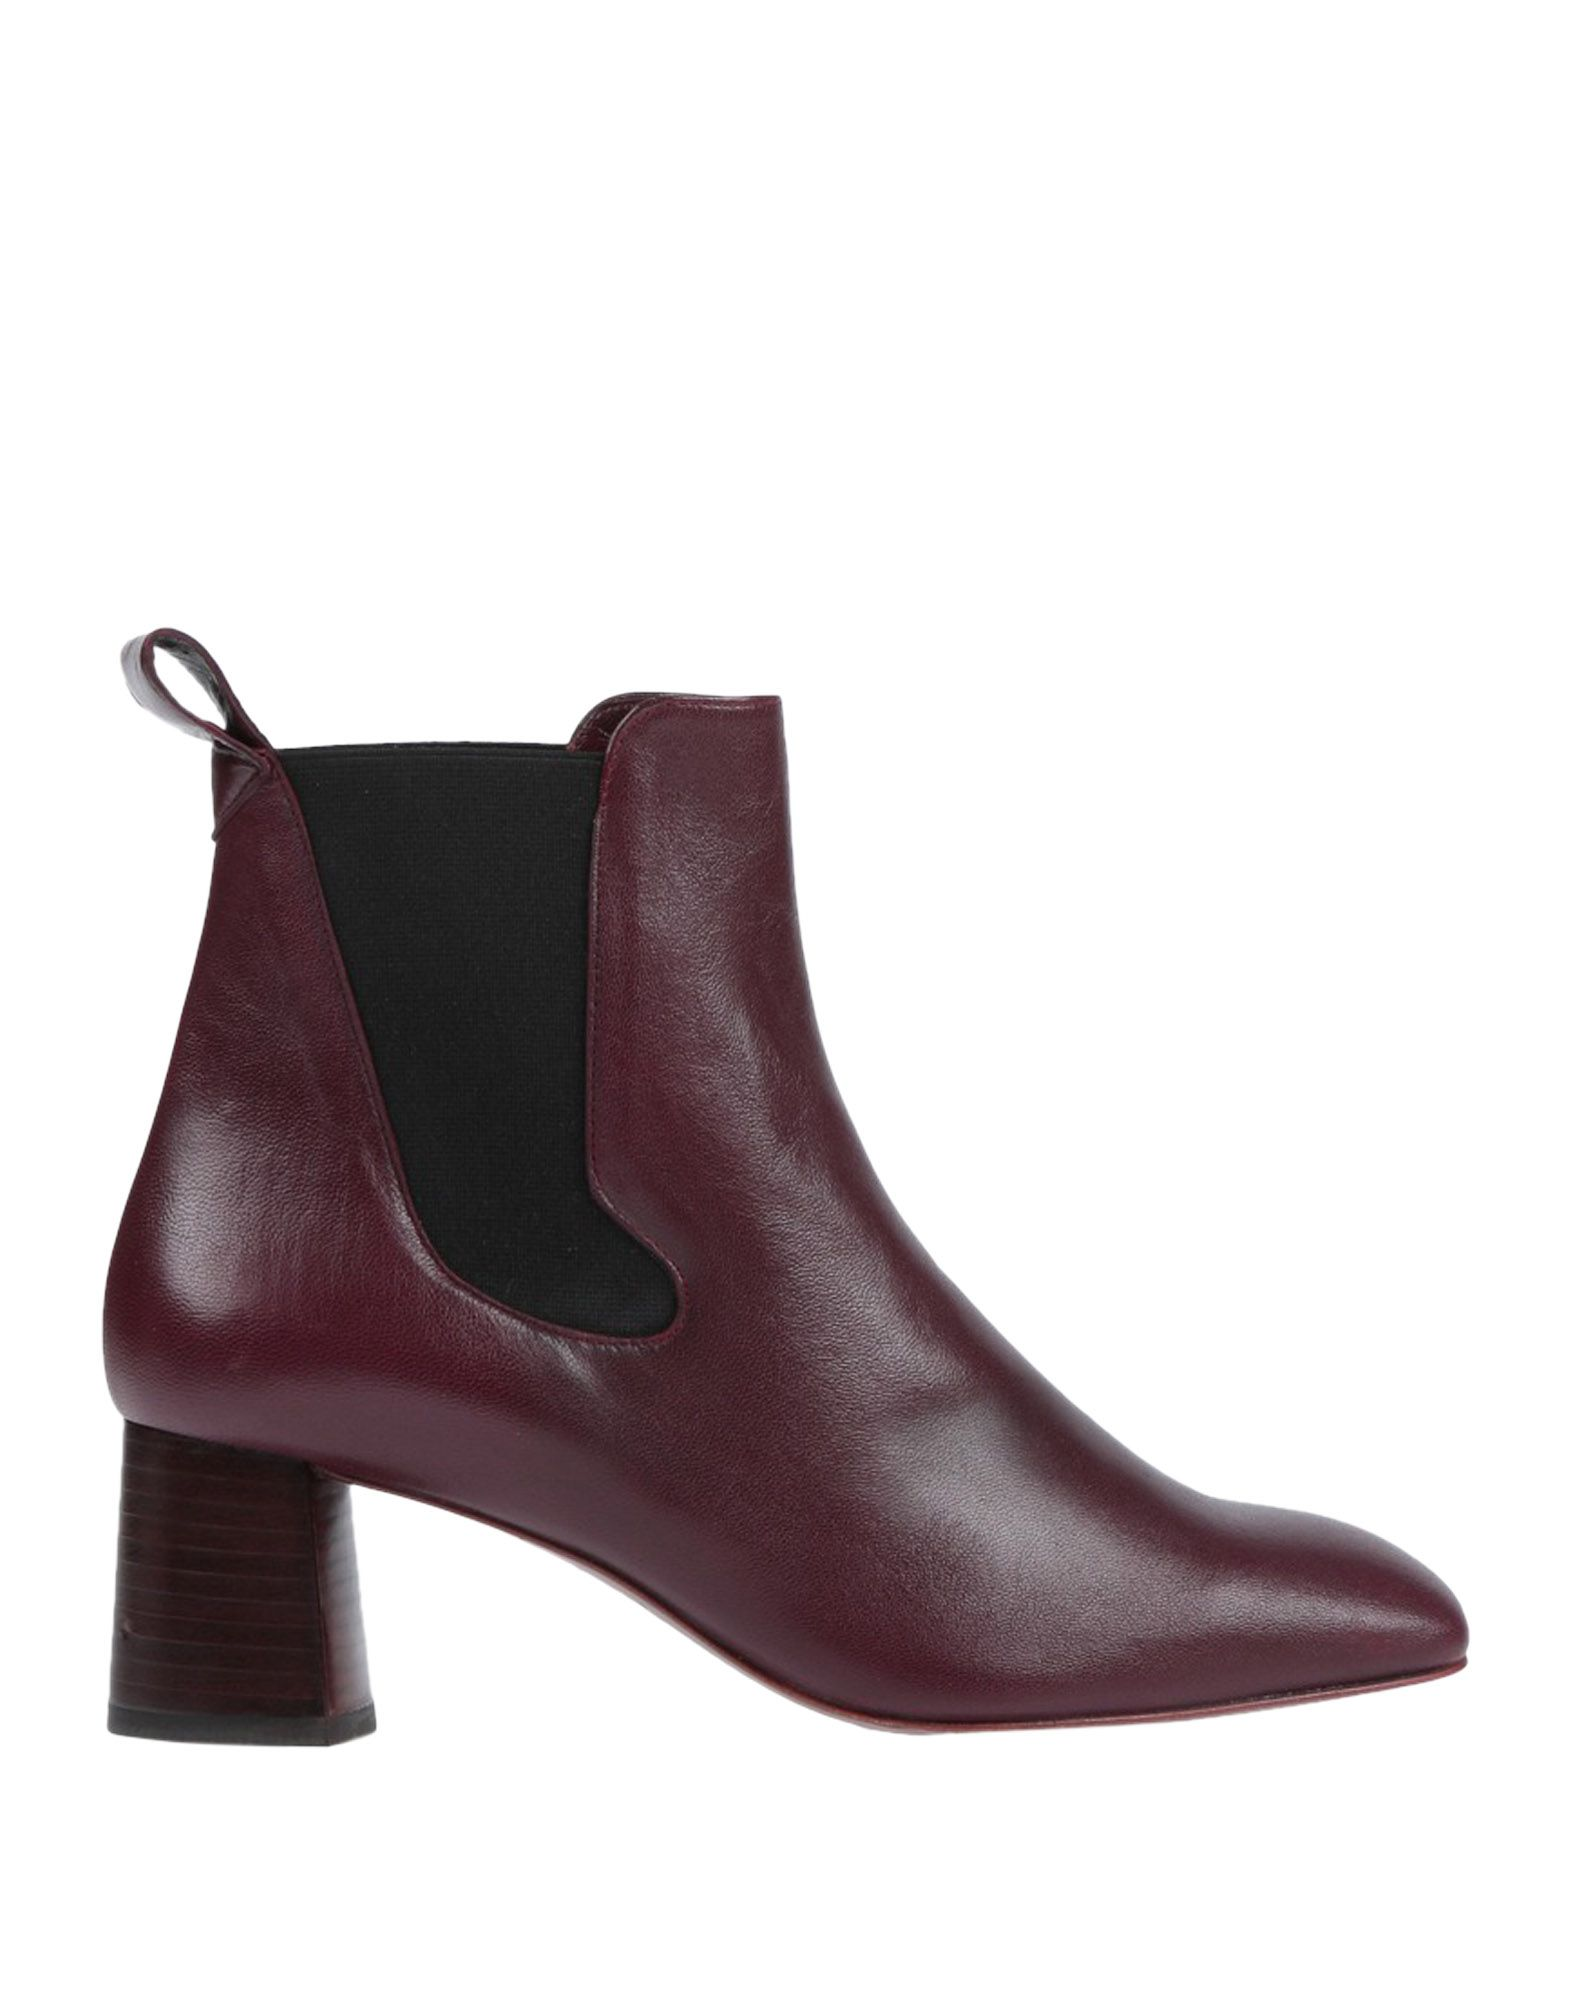 Avril Gau Chelsea Boots Damen Schuhe  11539344XTGut aussehende strapazierfähige Schuhe Damen 7c3fa9